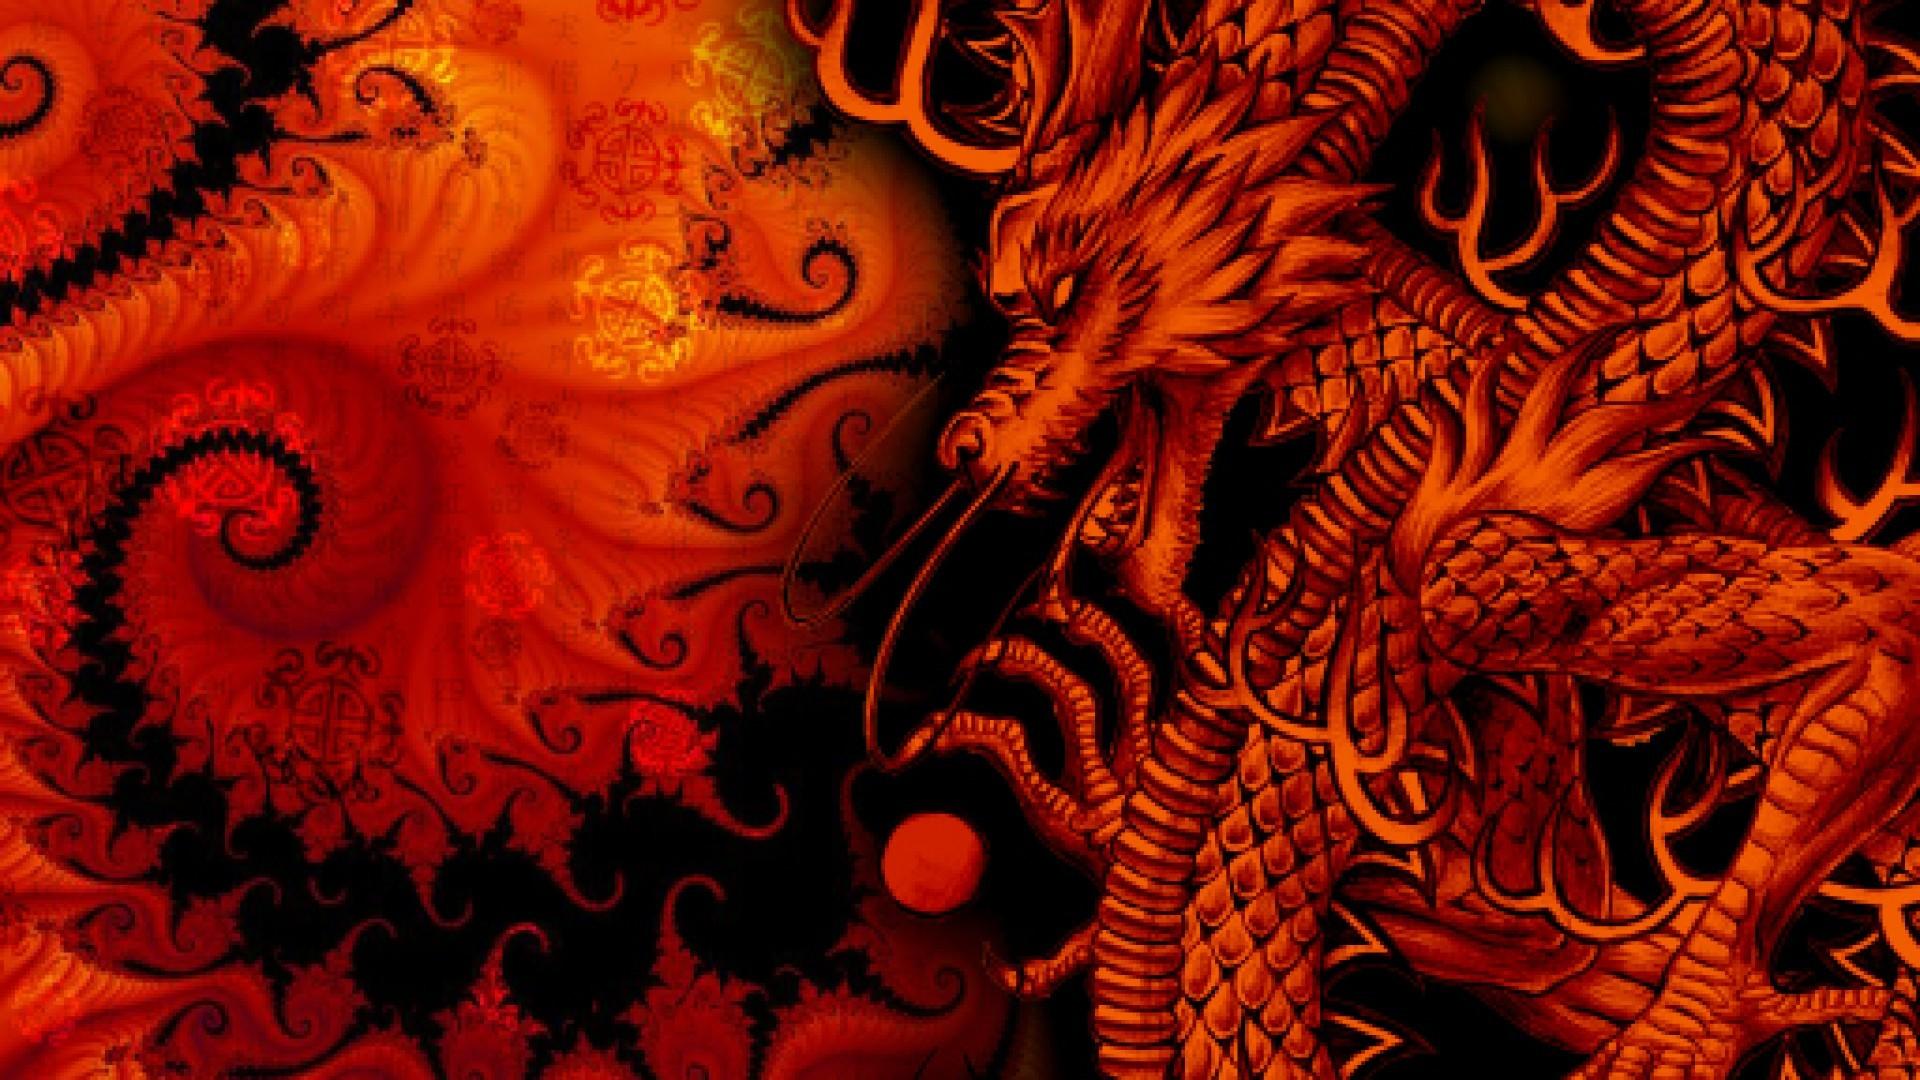 Dragon Wallpaper Images Inspiring – fullwidehd.com